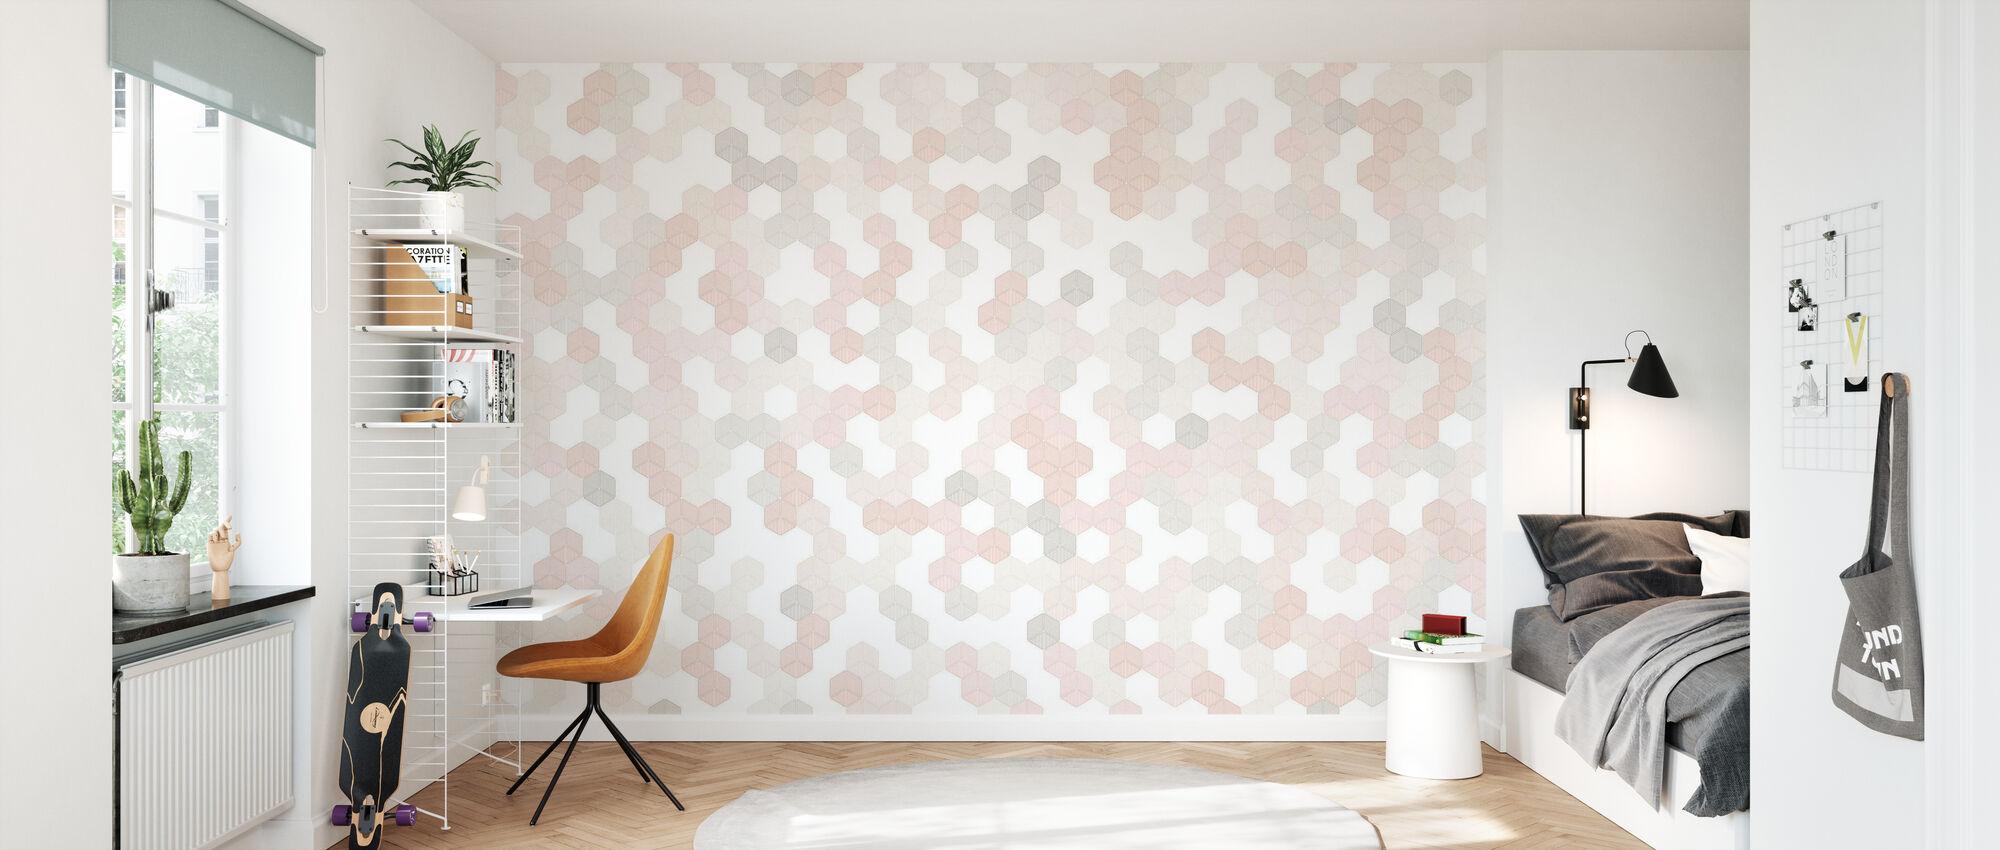 Hexagon - Rosa - Tapete - Kinderzimmer